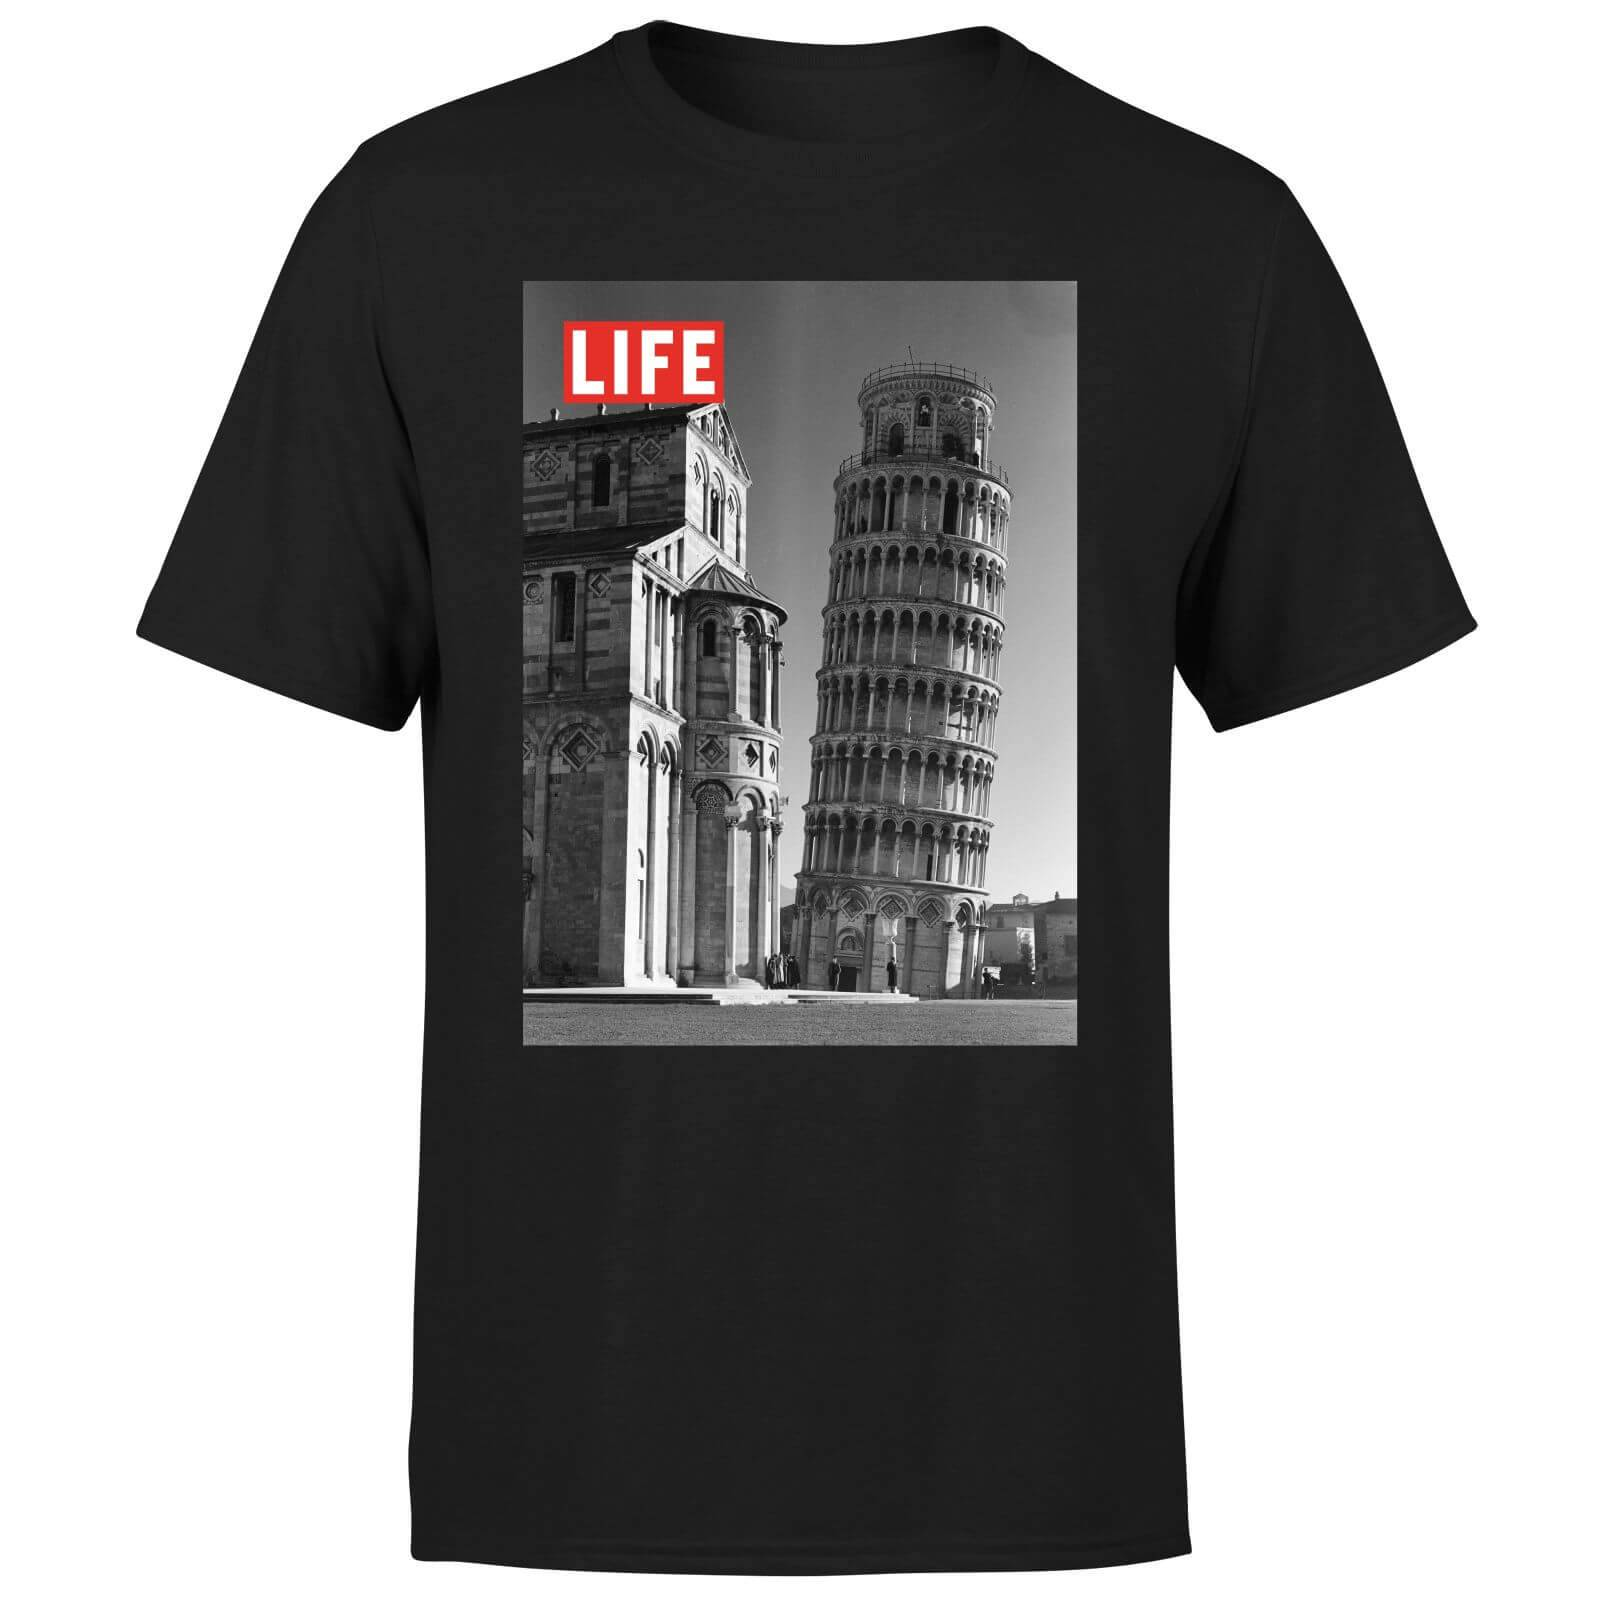 LIFE Magazine Tower Of Pisa Men's T-Shirt - Black - L - Black-male